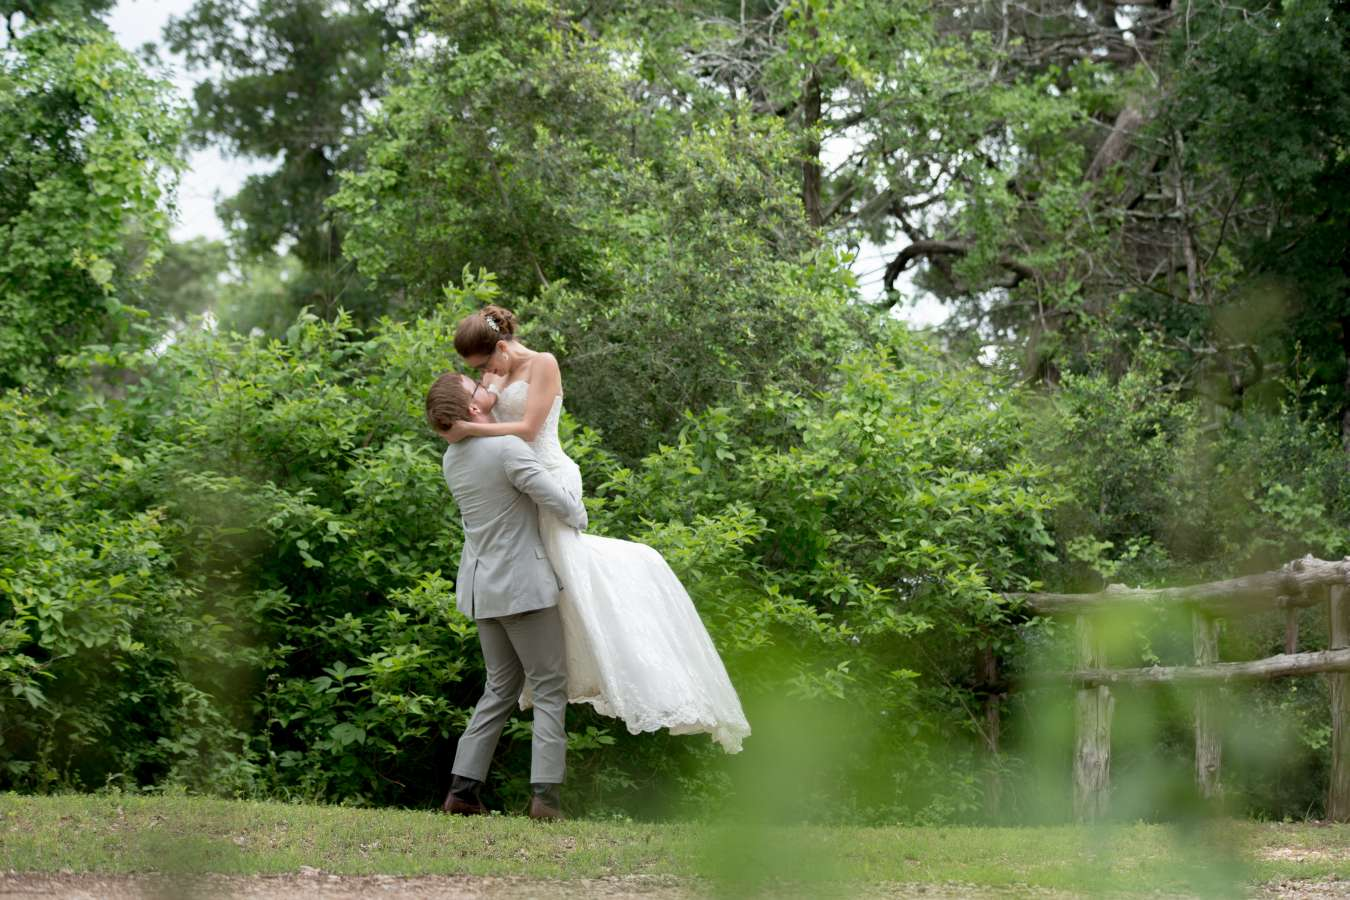 HighDot-Studios-Wedding-Cedar-Bend-Event-Center -Austin-Kim and Mike (44)